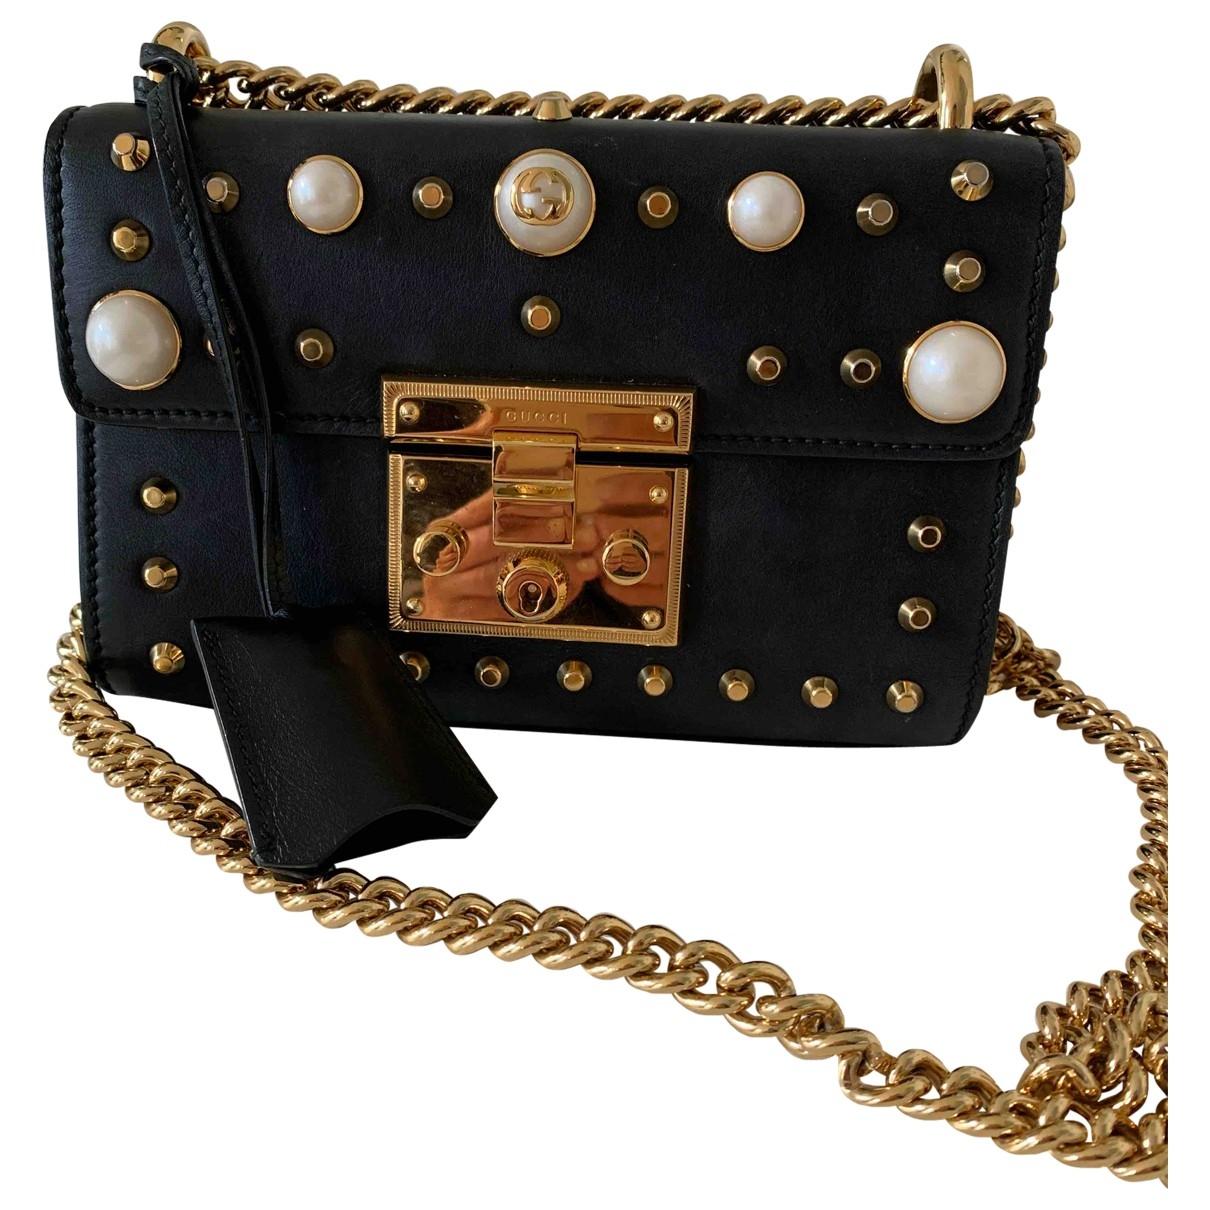 Gucci Padlock Handtasche in  Schwarz Leder